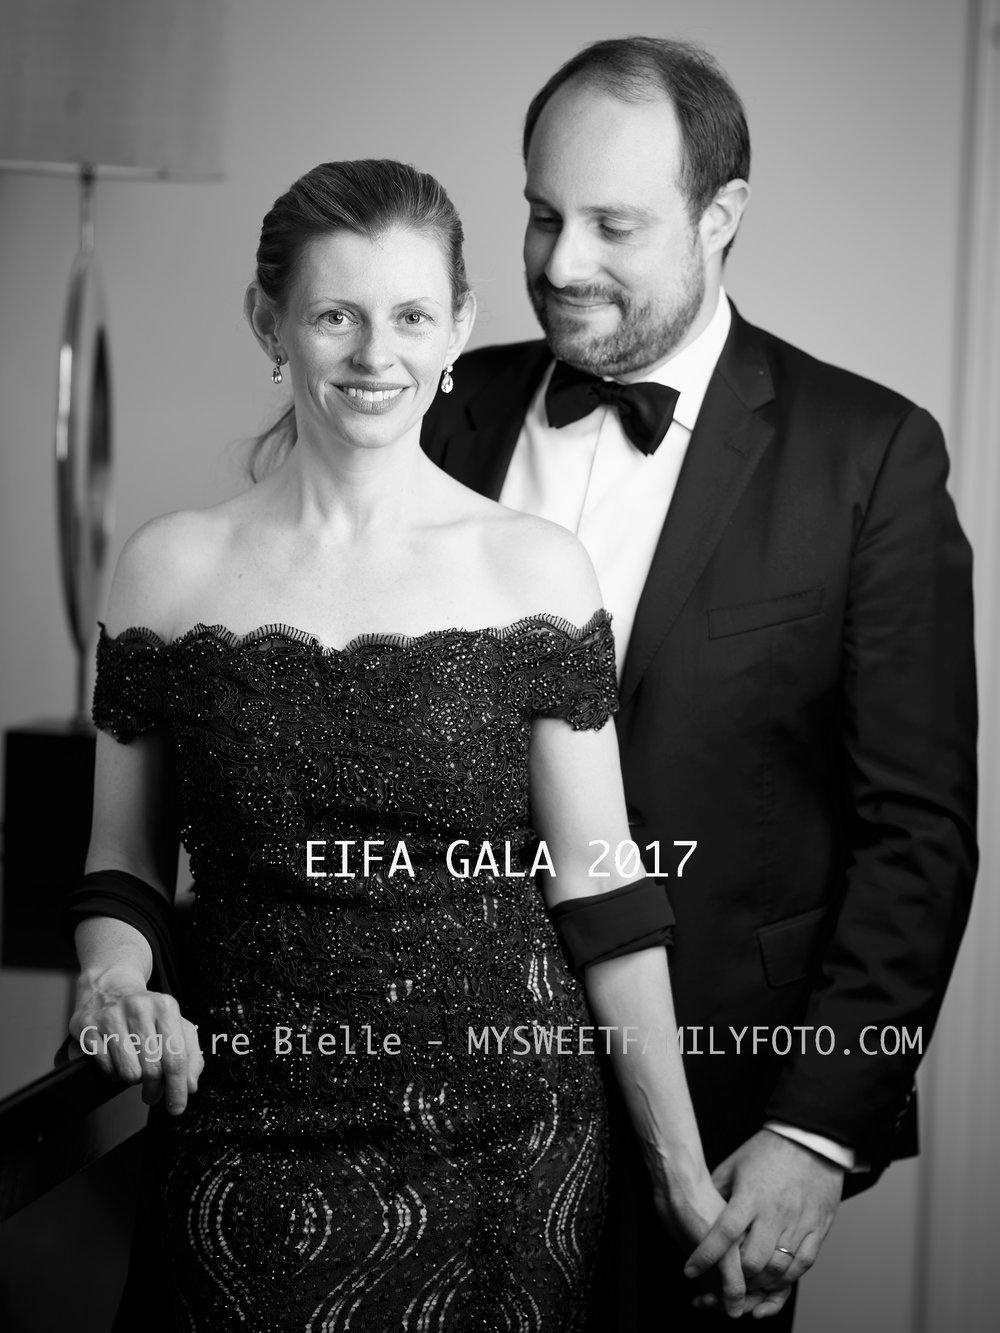 EIFA GALA 1150.jpg